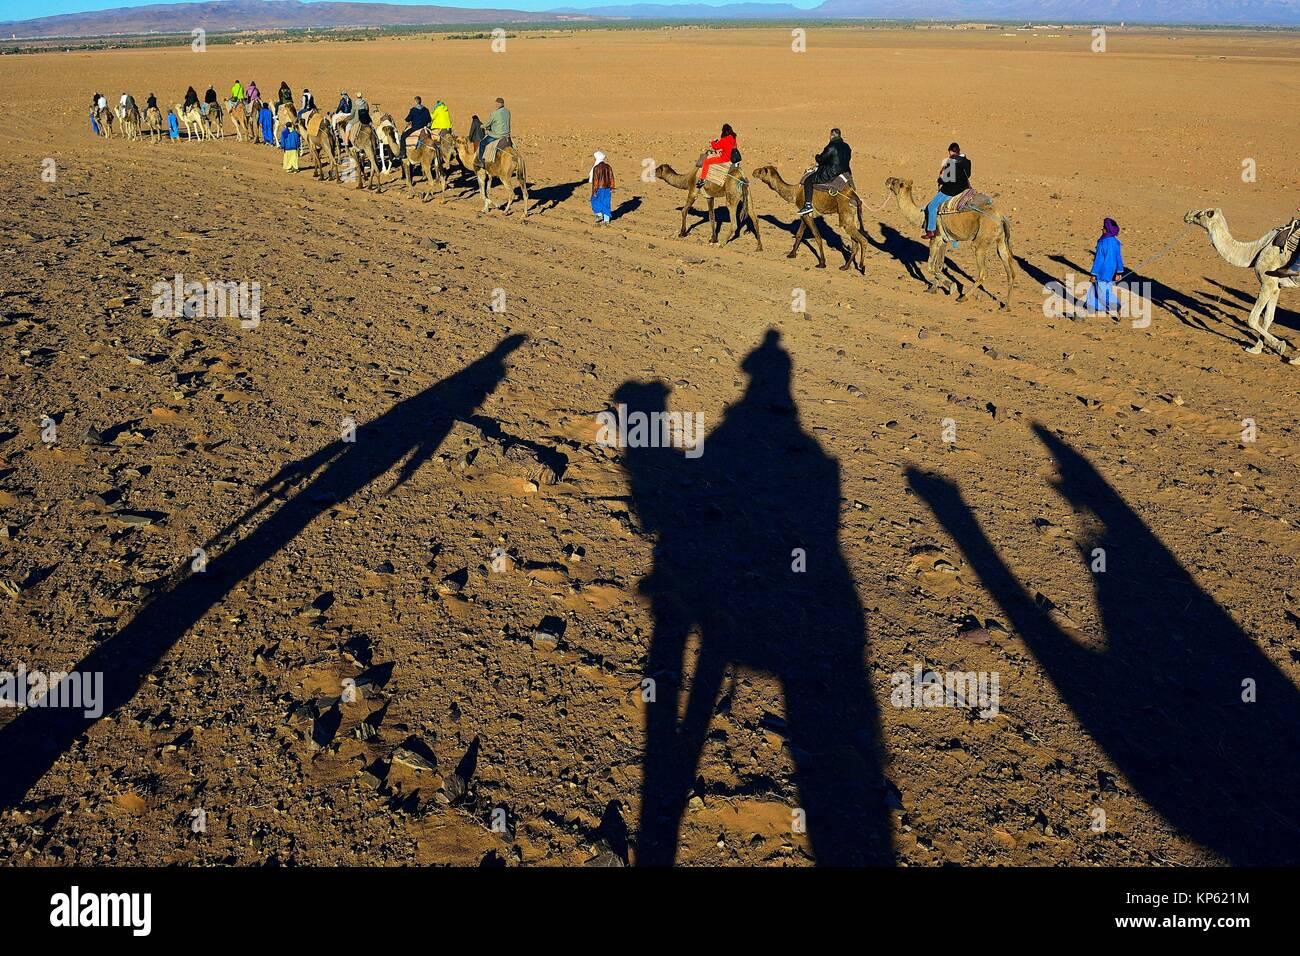 Tourism in the desert near Zagora, South of Morocco. - Stock Image